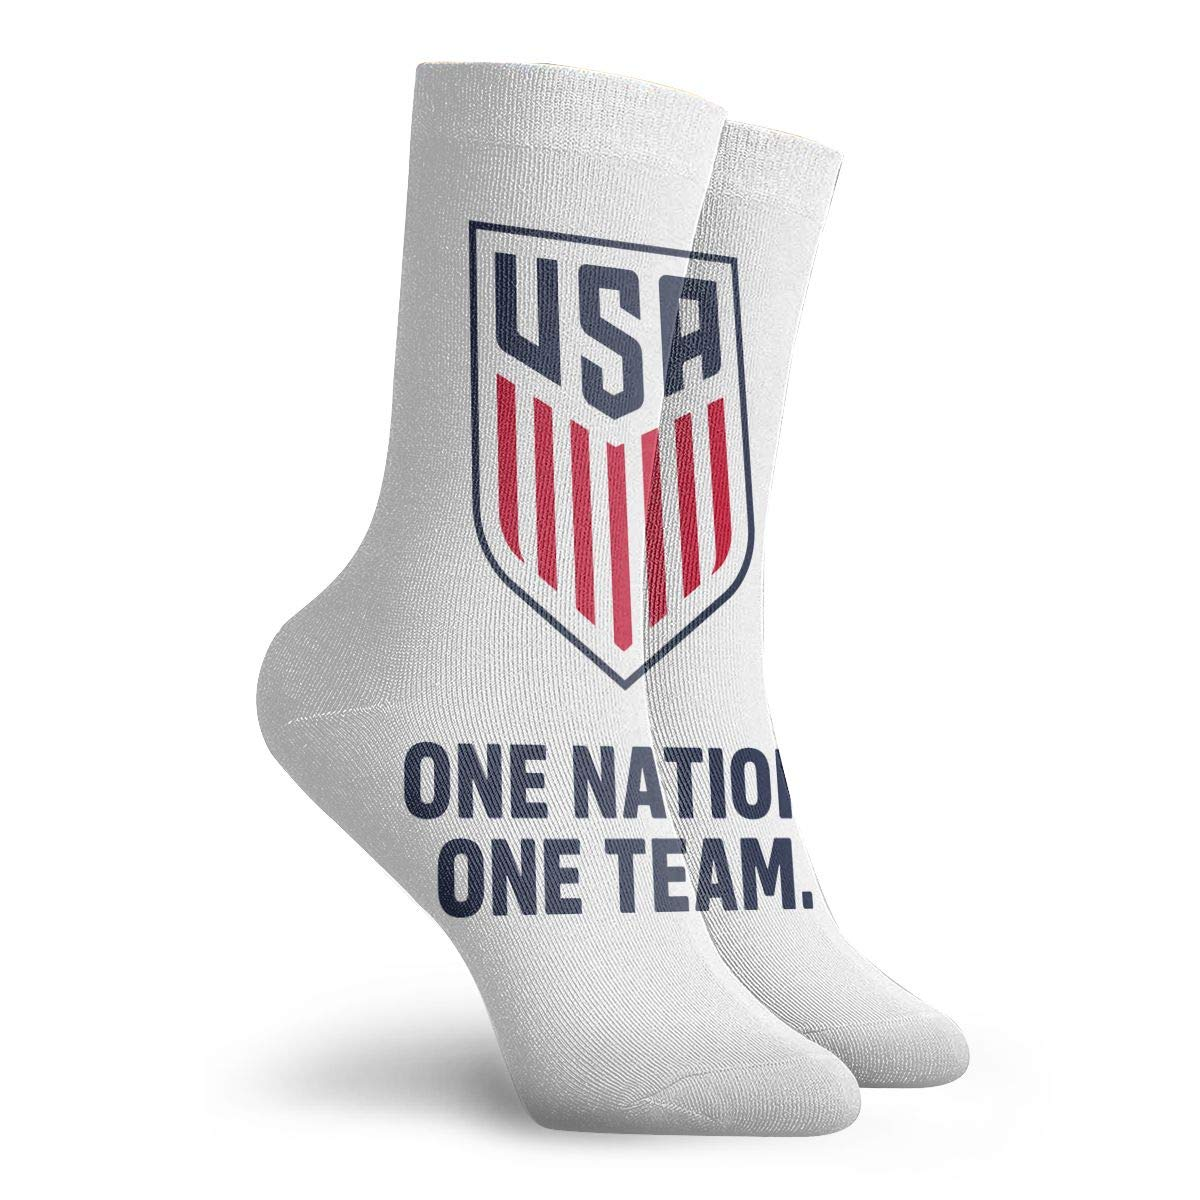 Athletic Quarter Ankle Print Breathable Hiking Running Socks Unisex 2016 Olympic Team USA Wrestling Logo 12